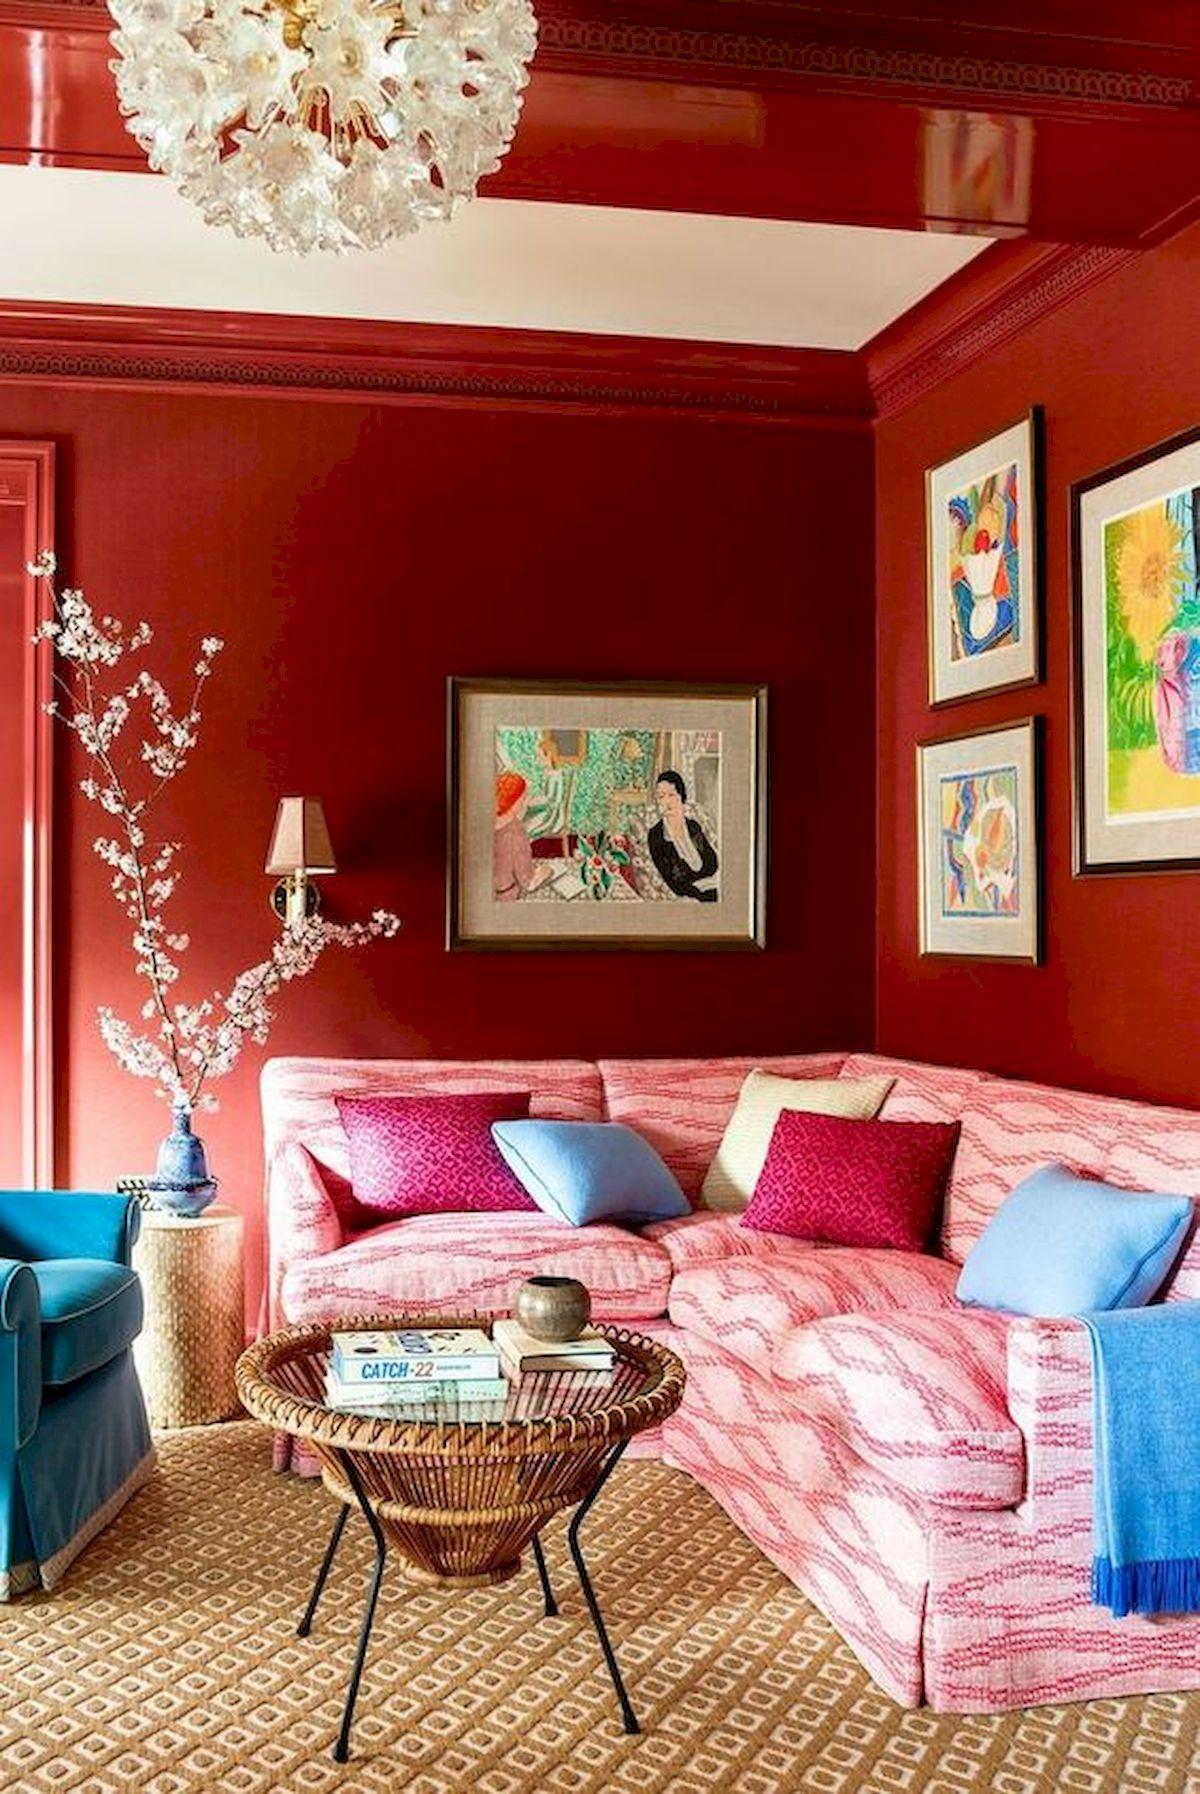 45 Brilliant DIY Living Room Design And Decor Ideas For Small Apartment (29)